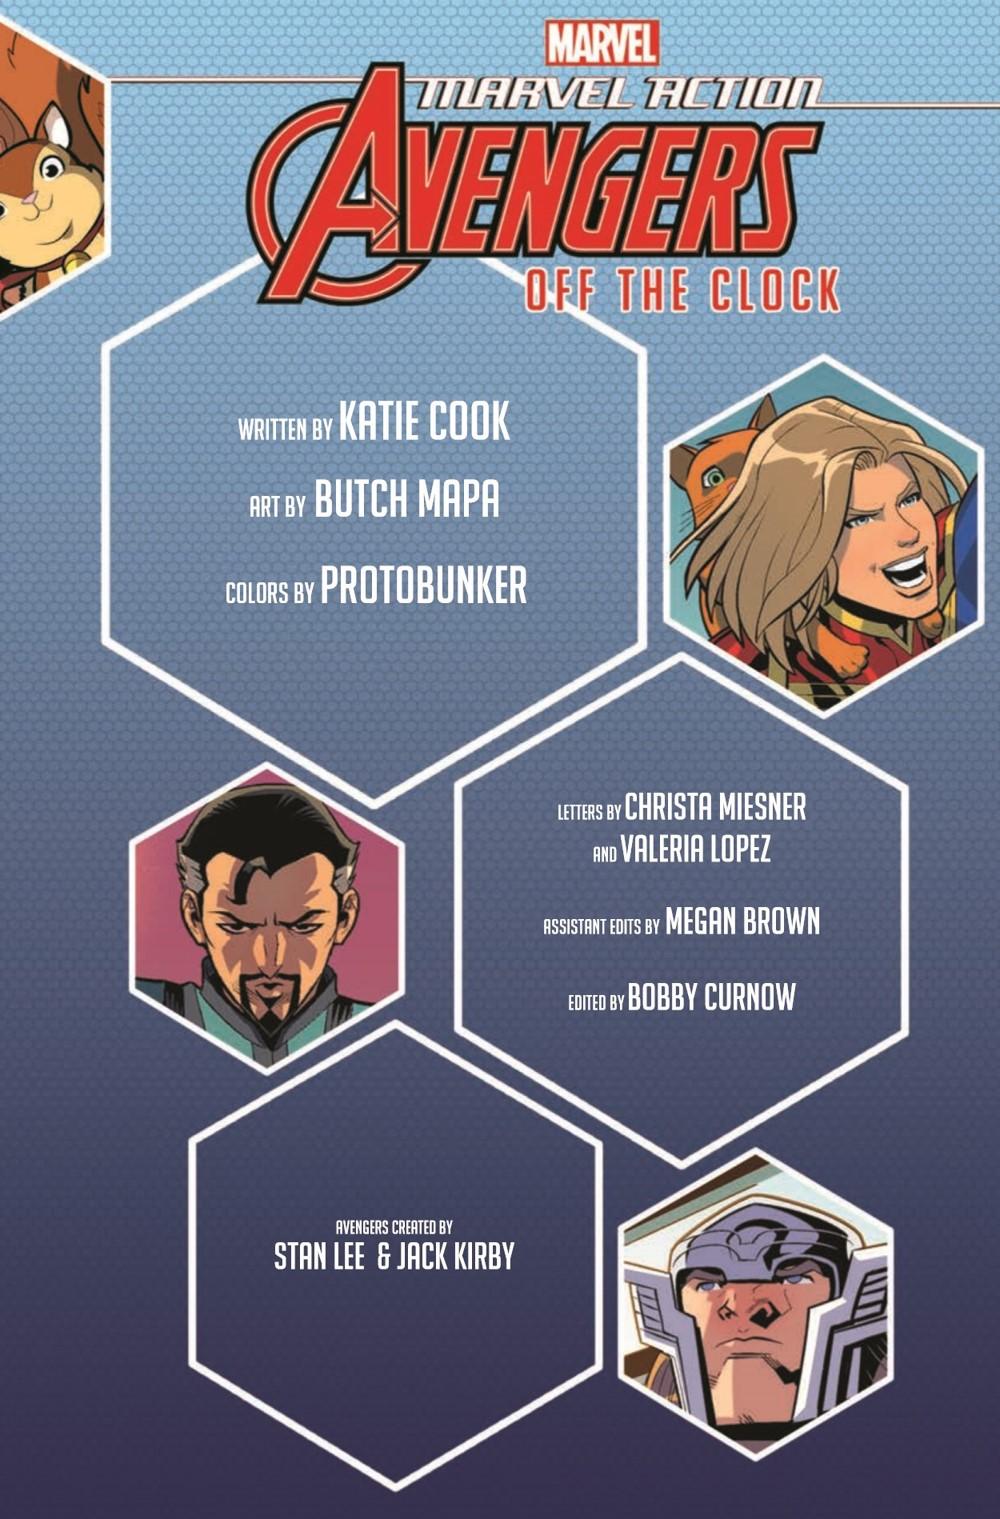 MarvelAction_Avengers_Vol.1_OffTheClock_TPB_pr-3 ComicList Previews: MARVEL ACTION AVENGERS VOLUME 5 OFF THE CLOCK TP